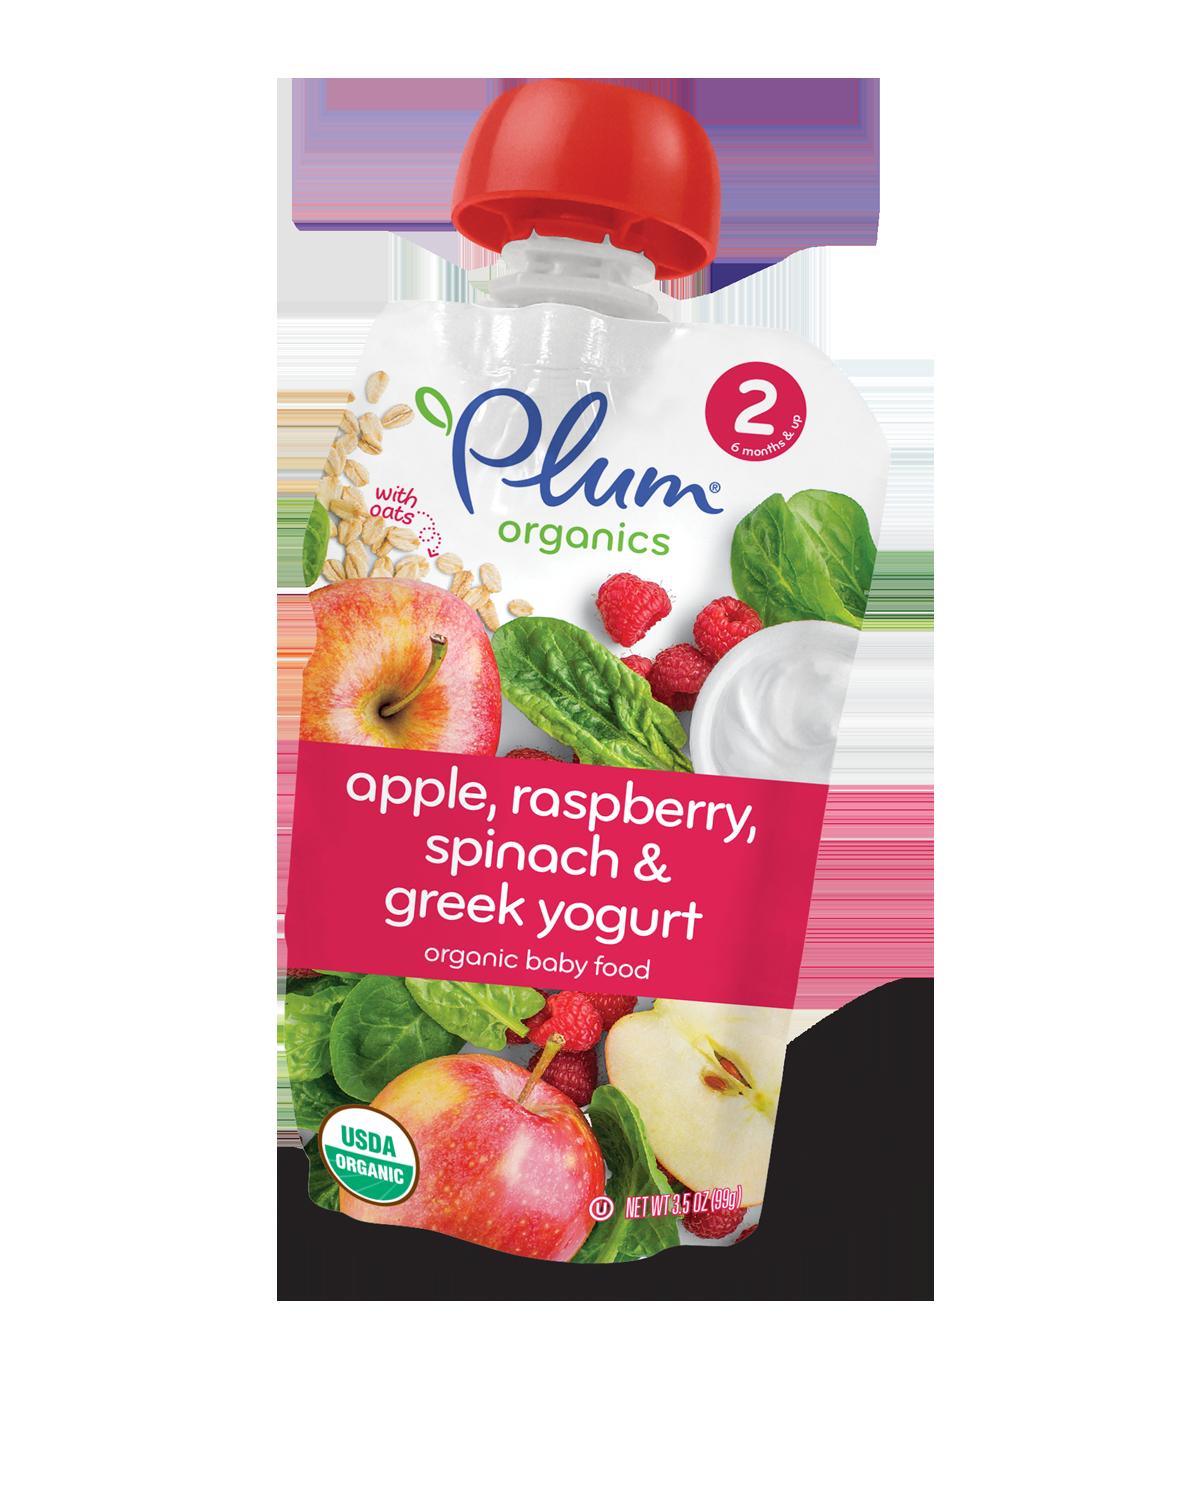 Plum Organics Second Blends Apple, Raspberry, Spinach & Greek Yogurt